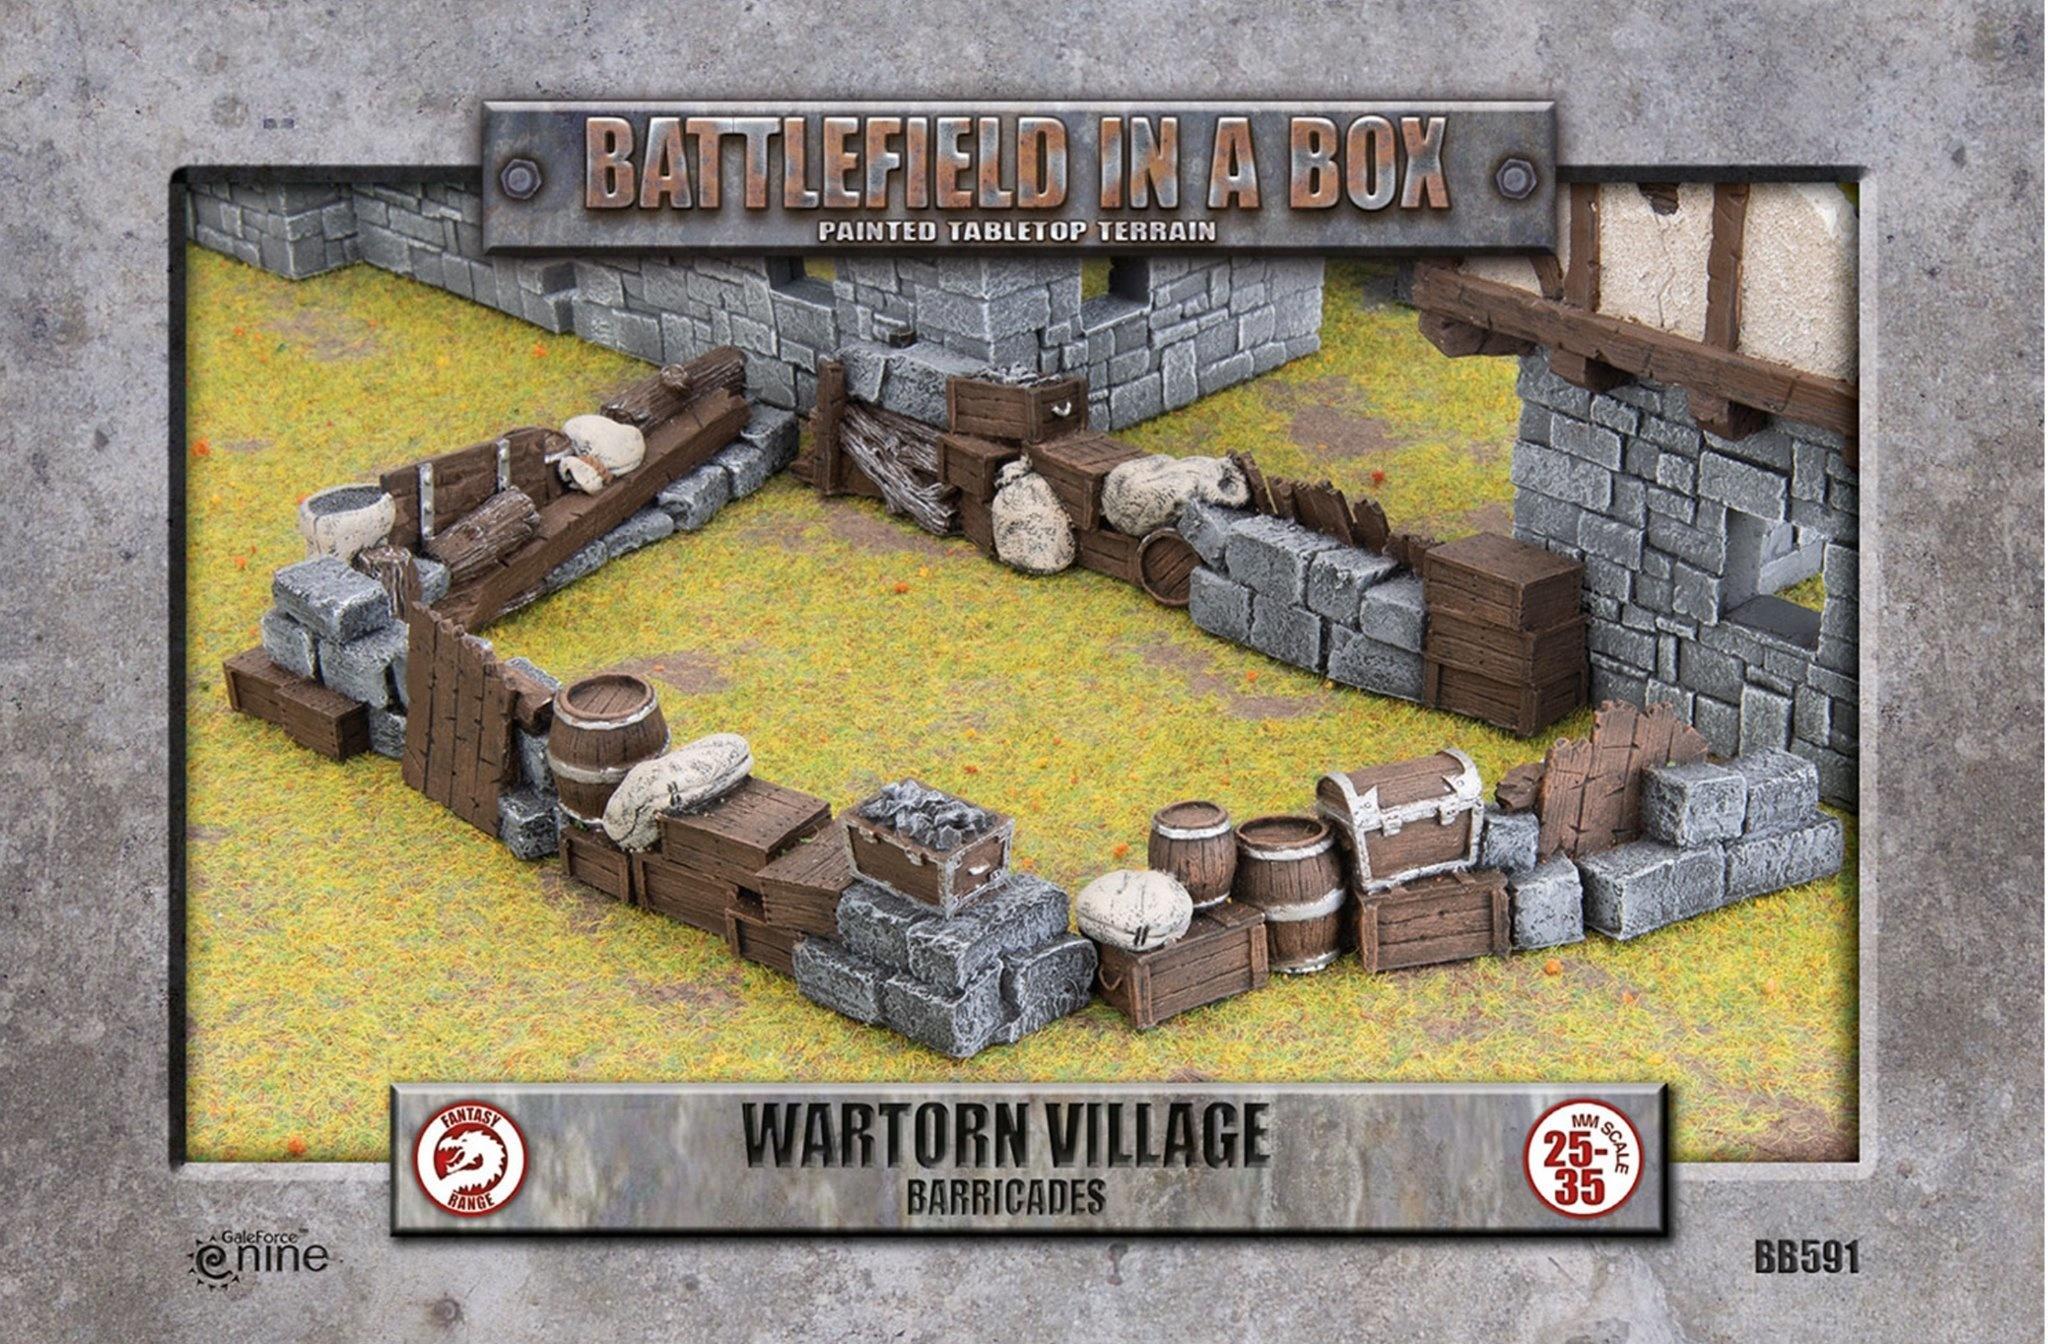 Battlefield in a Box: Wartorn Village Barricades